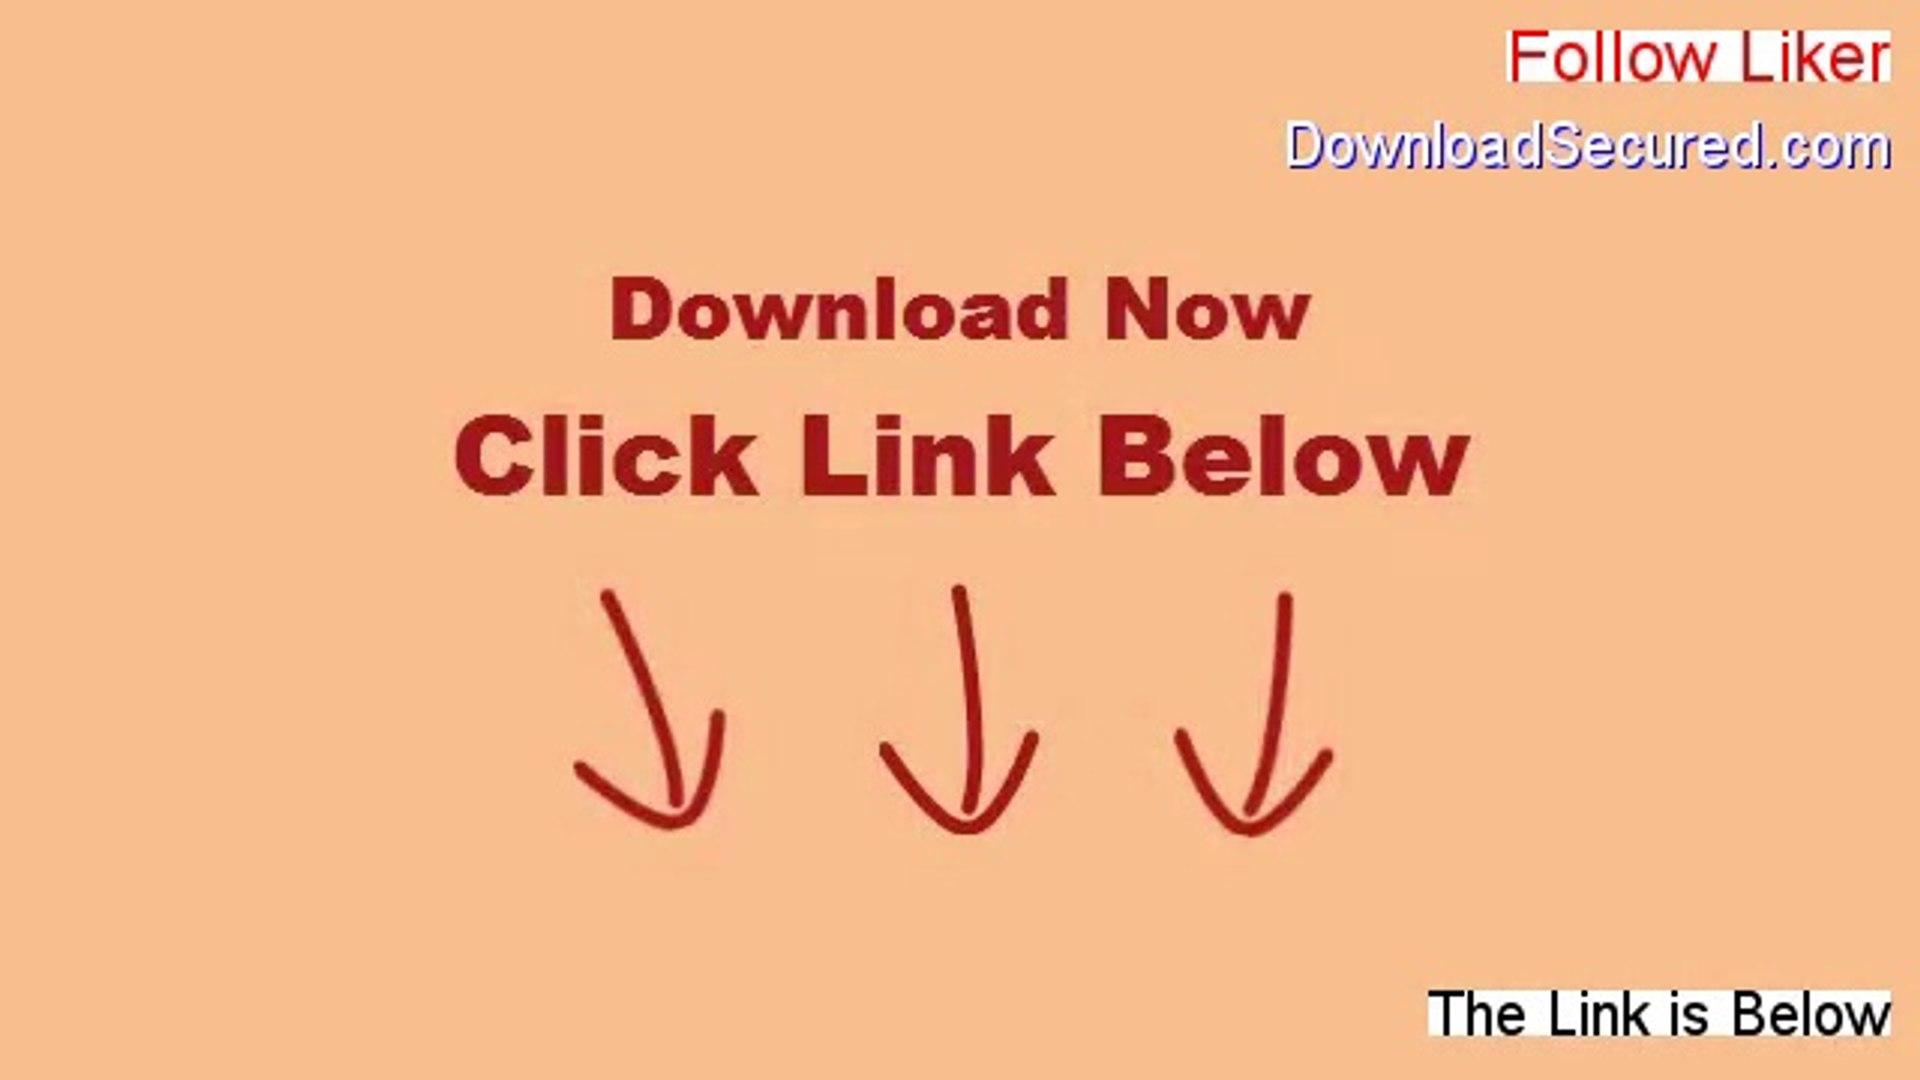 Follow Liker Download Free [Legit Download 2014]